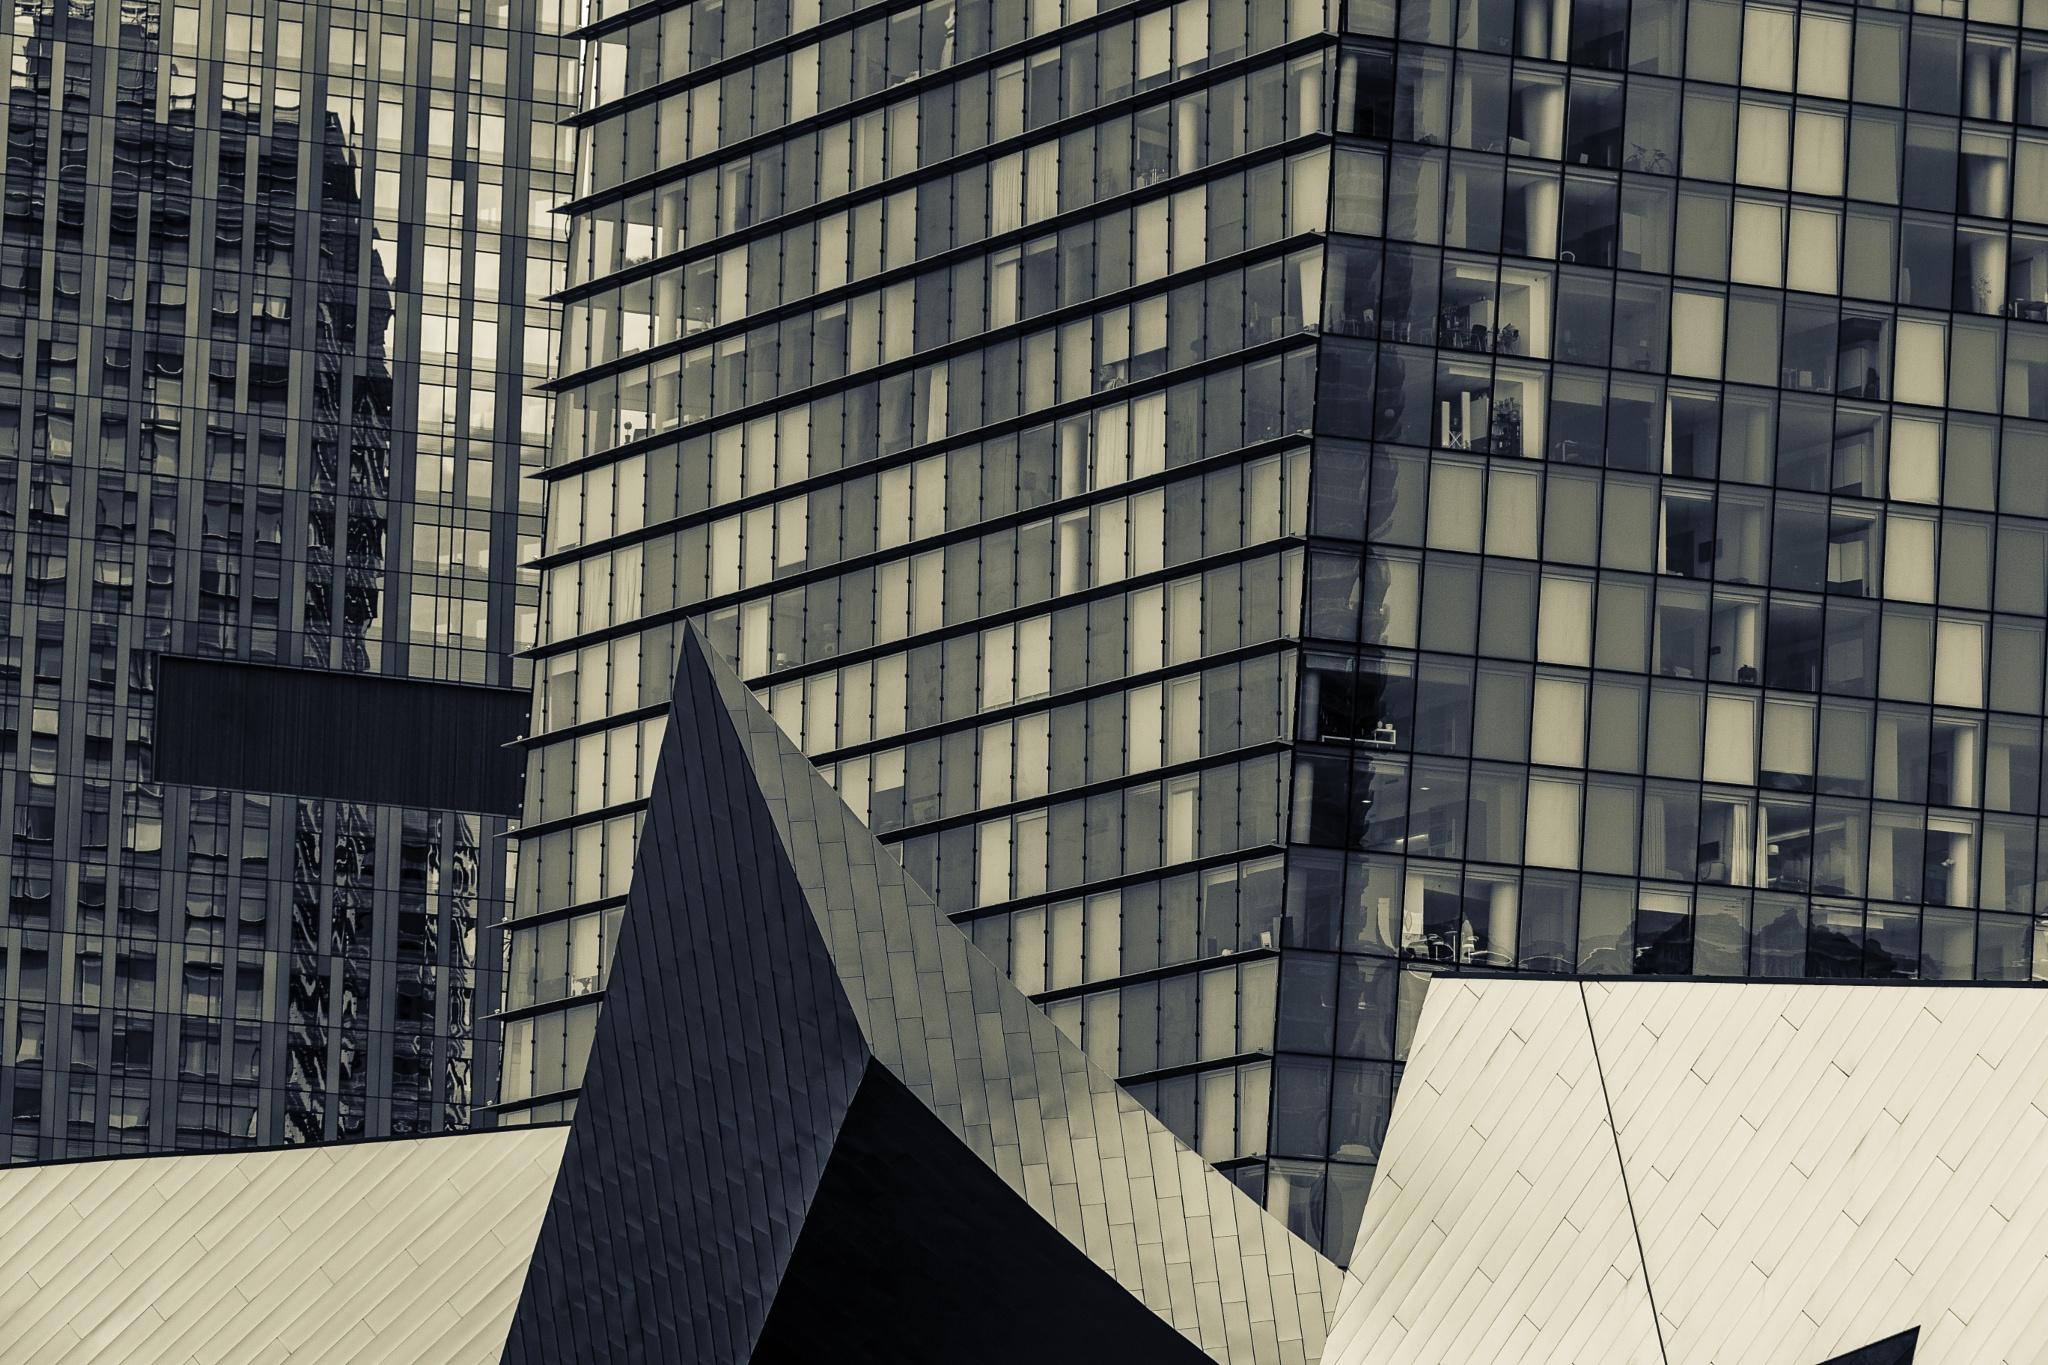 Geometric by Florin Bogdan Craete